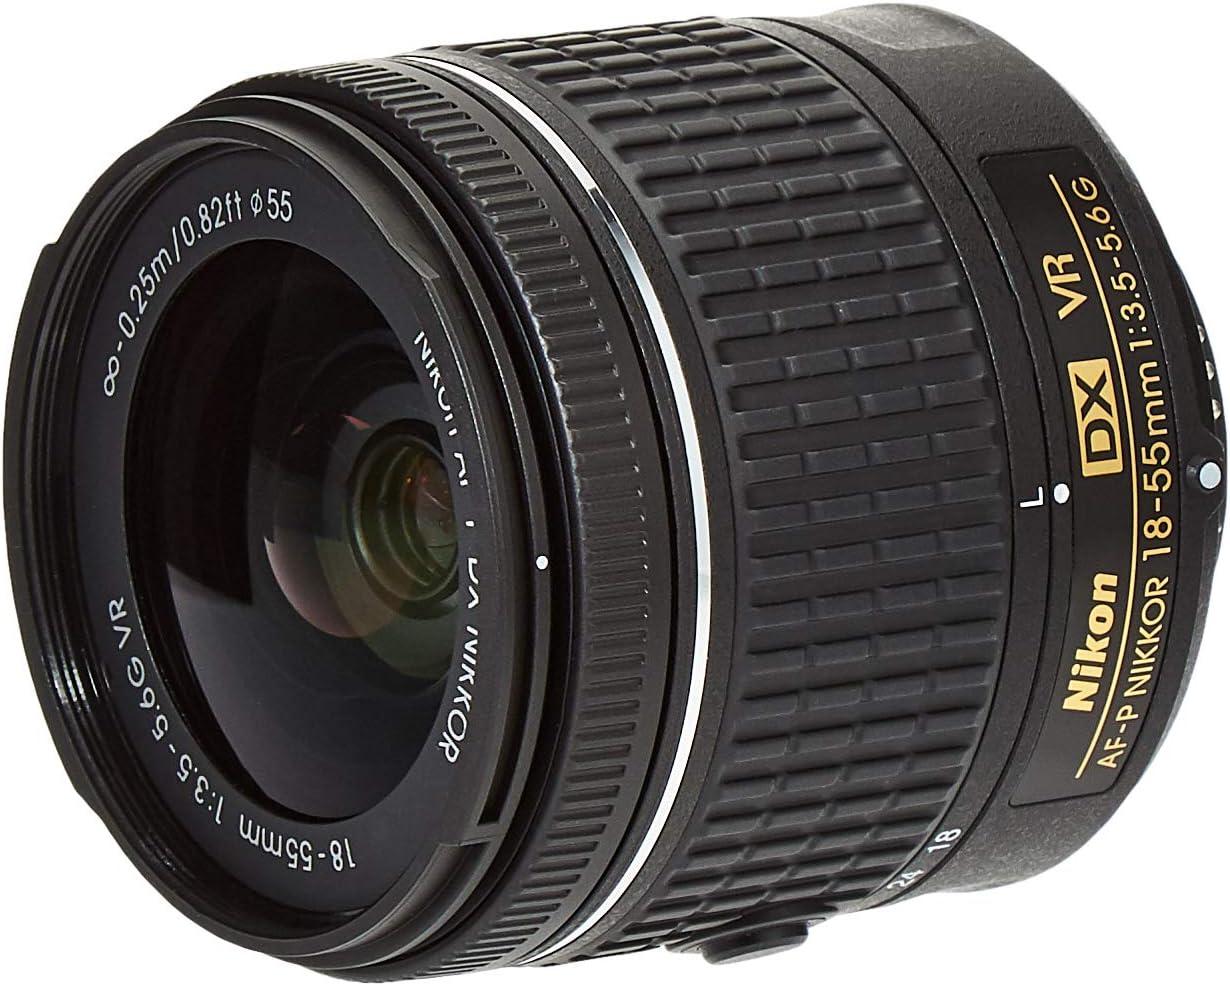 HB-50 Lens Hood for Nikon AF-S 28-300mm f3.5-5.6G ED VR Lens ILS